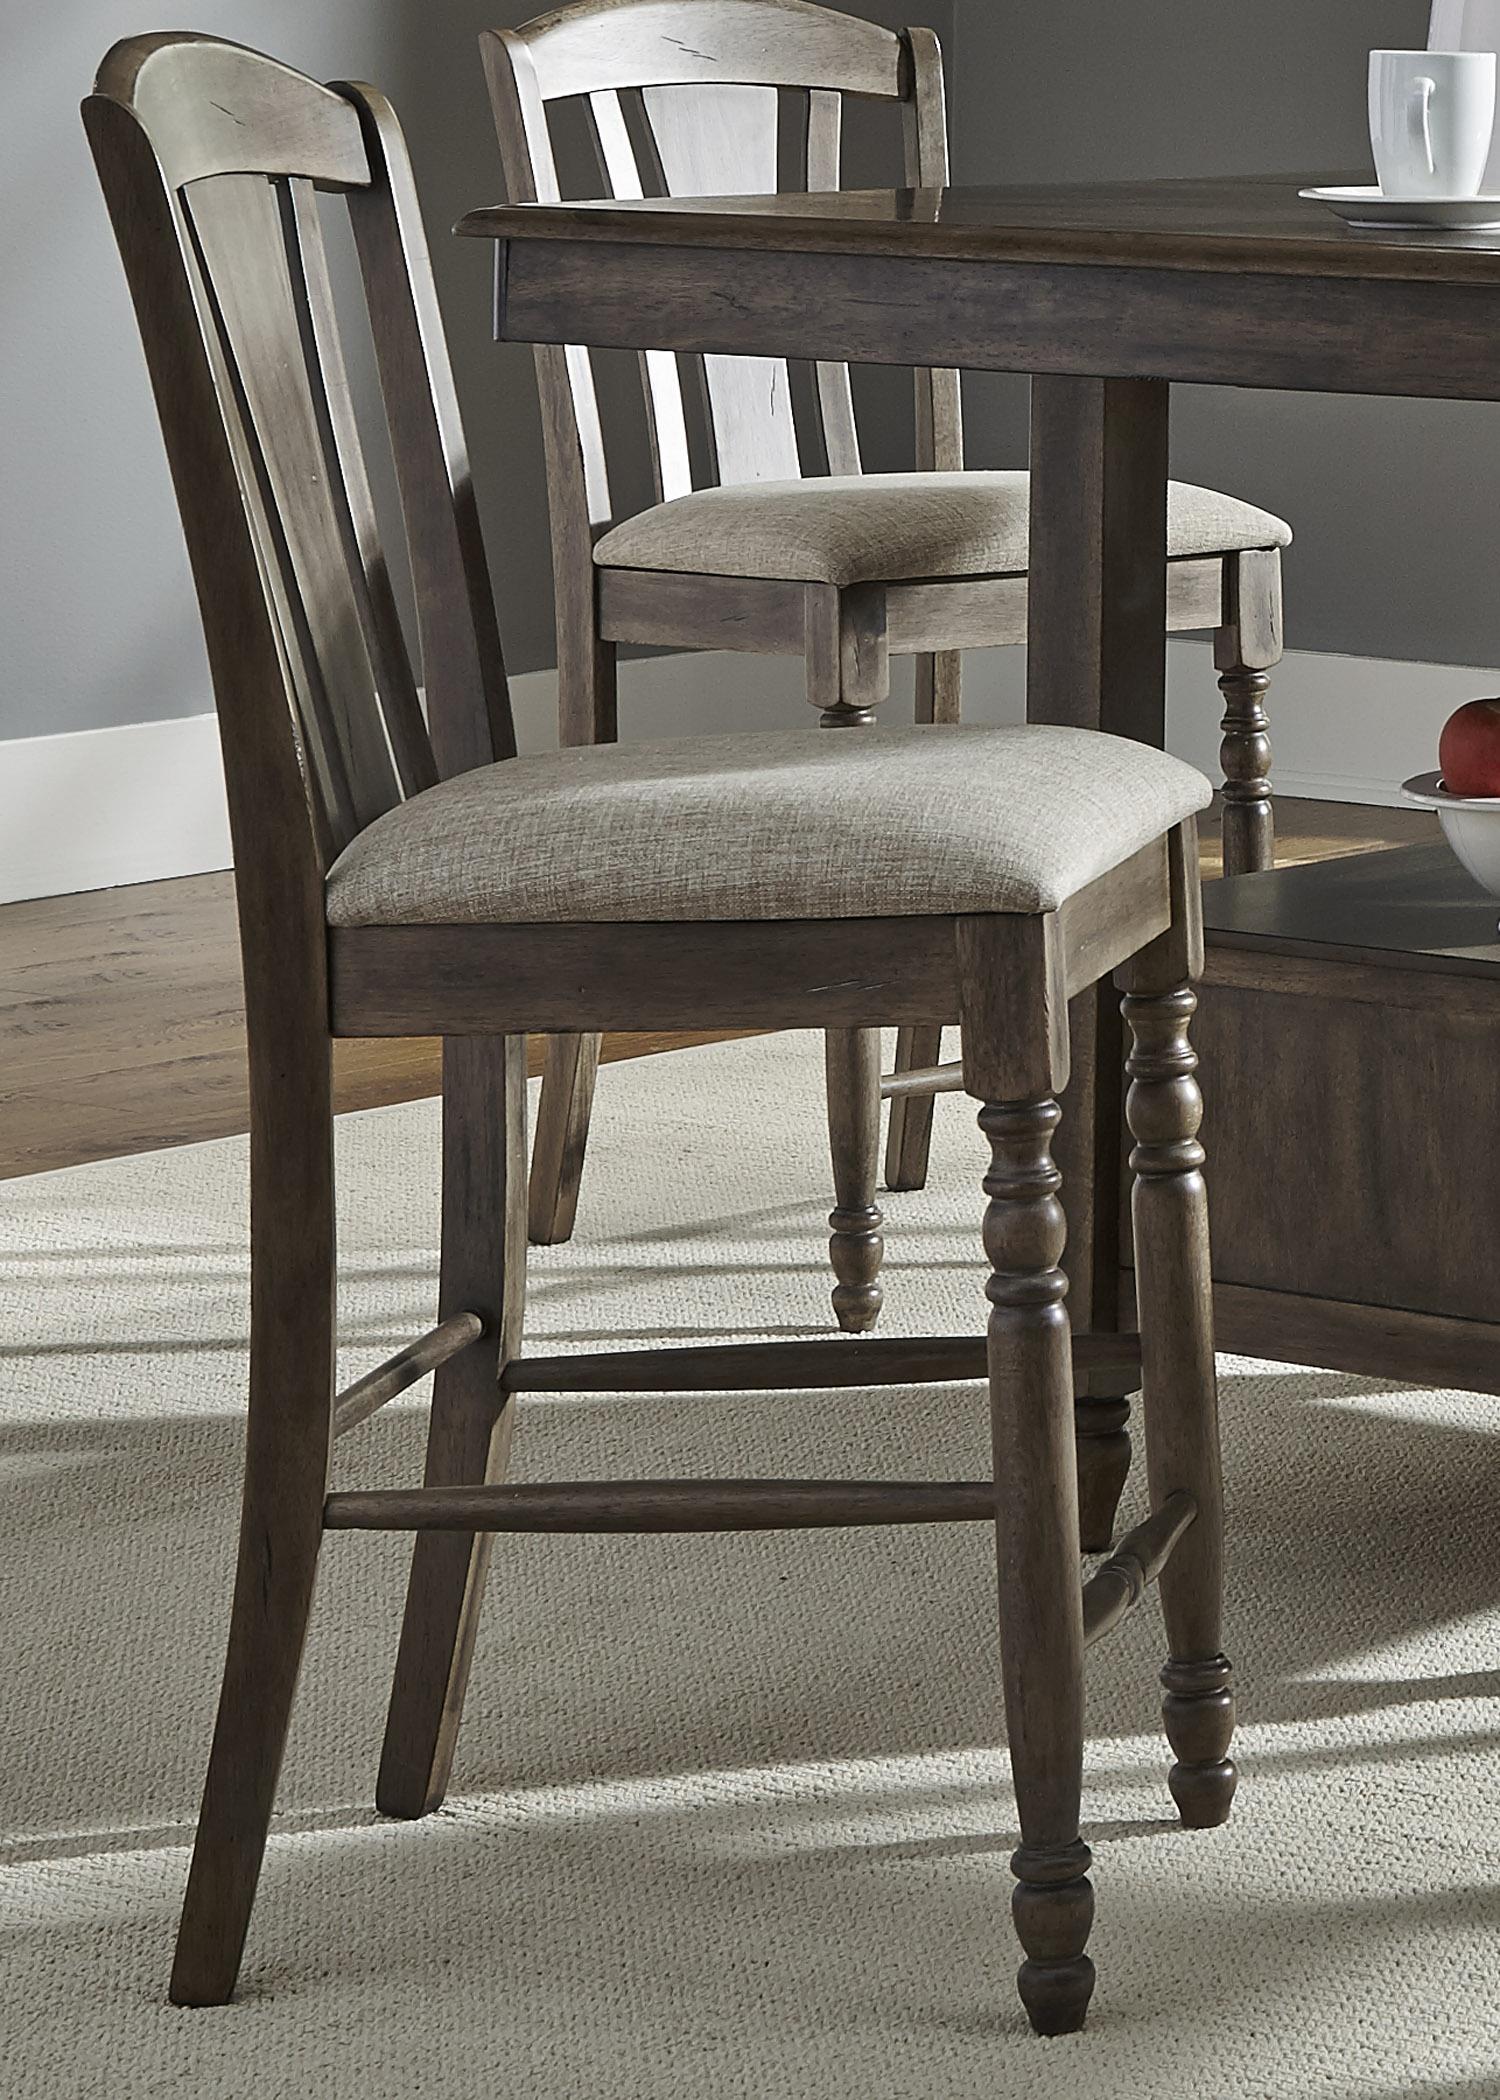 Liberty Furniture Candlewood RTA Slat Back Barstool - Item Number: 163-B150124